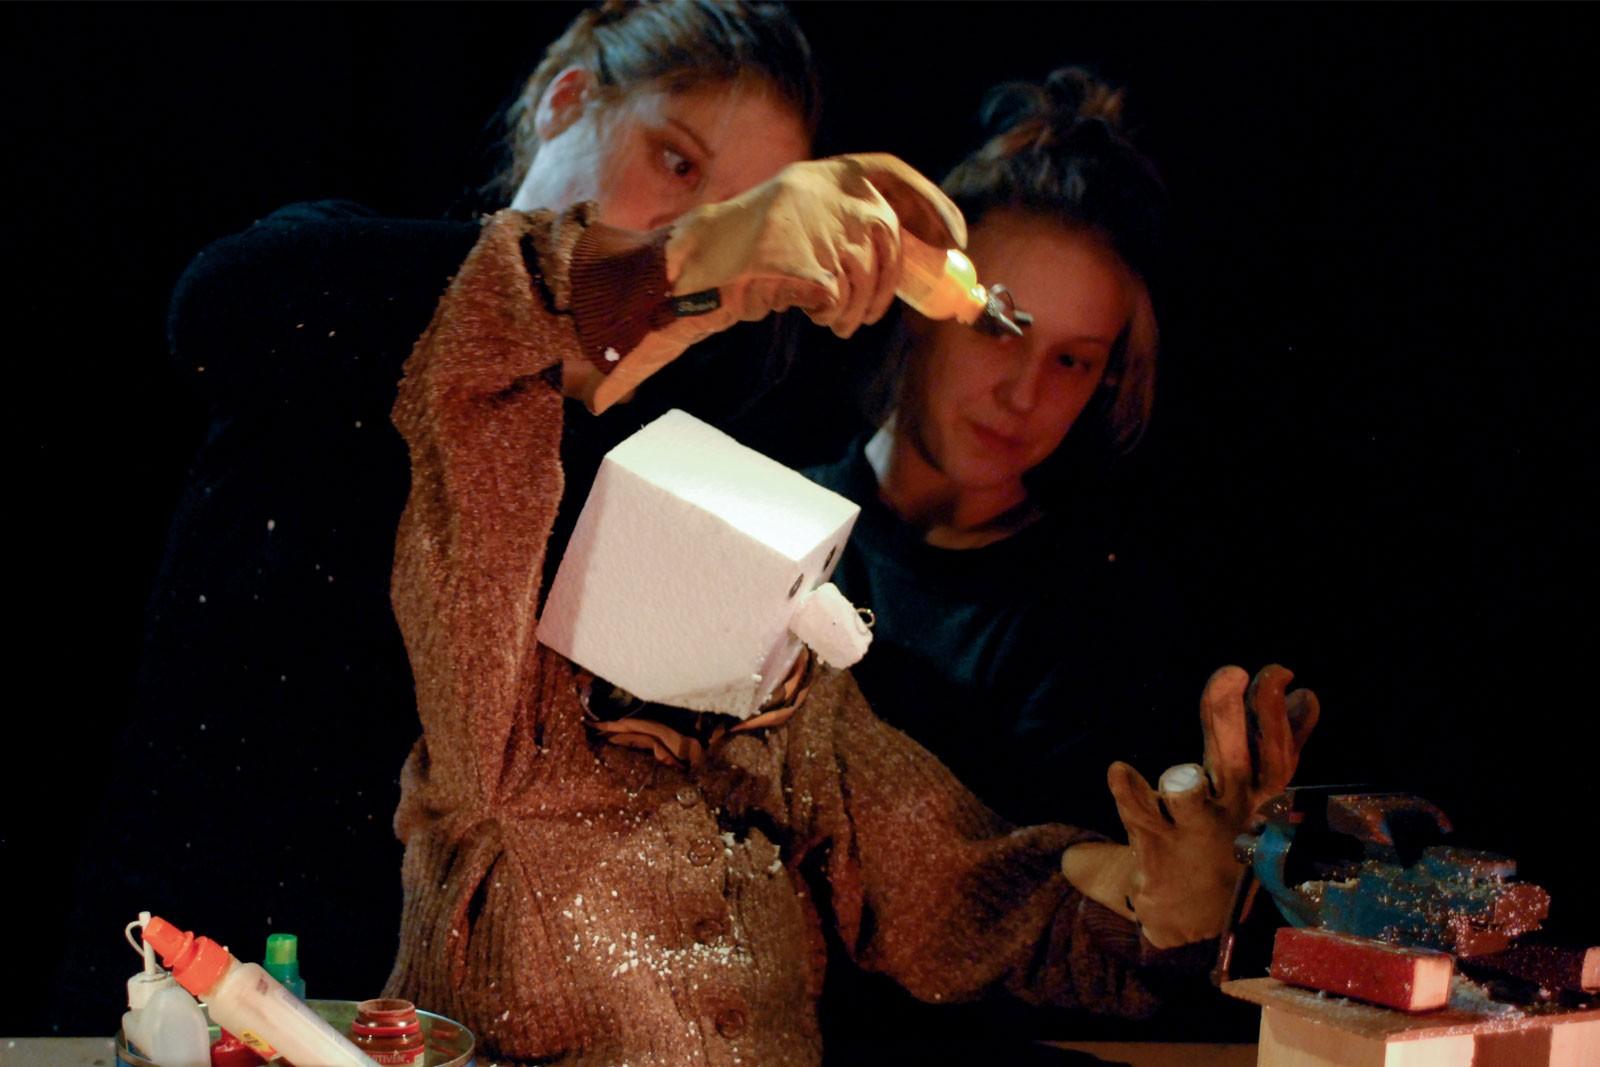 Dans l'atelier, festival charleroi bis-arts 2018 1